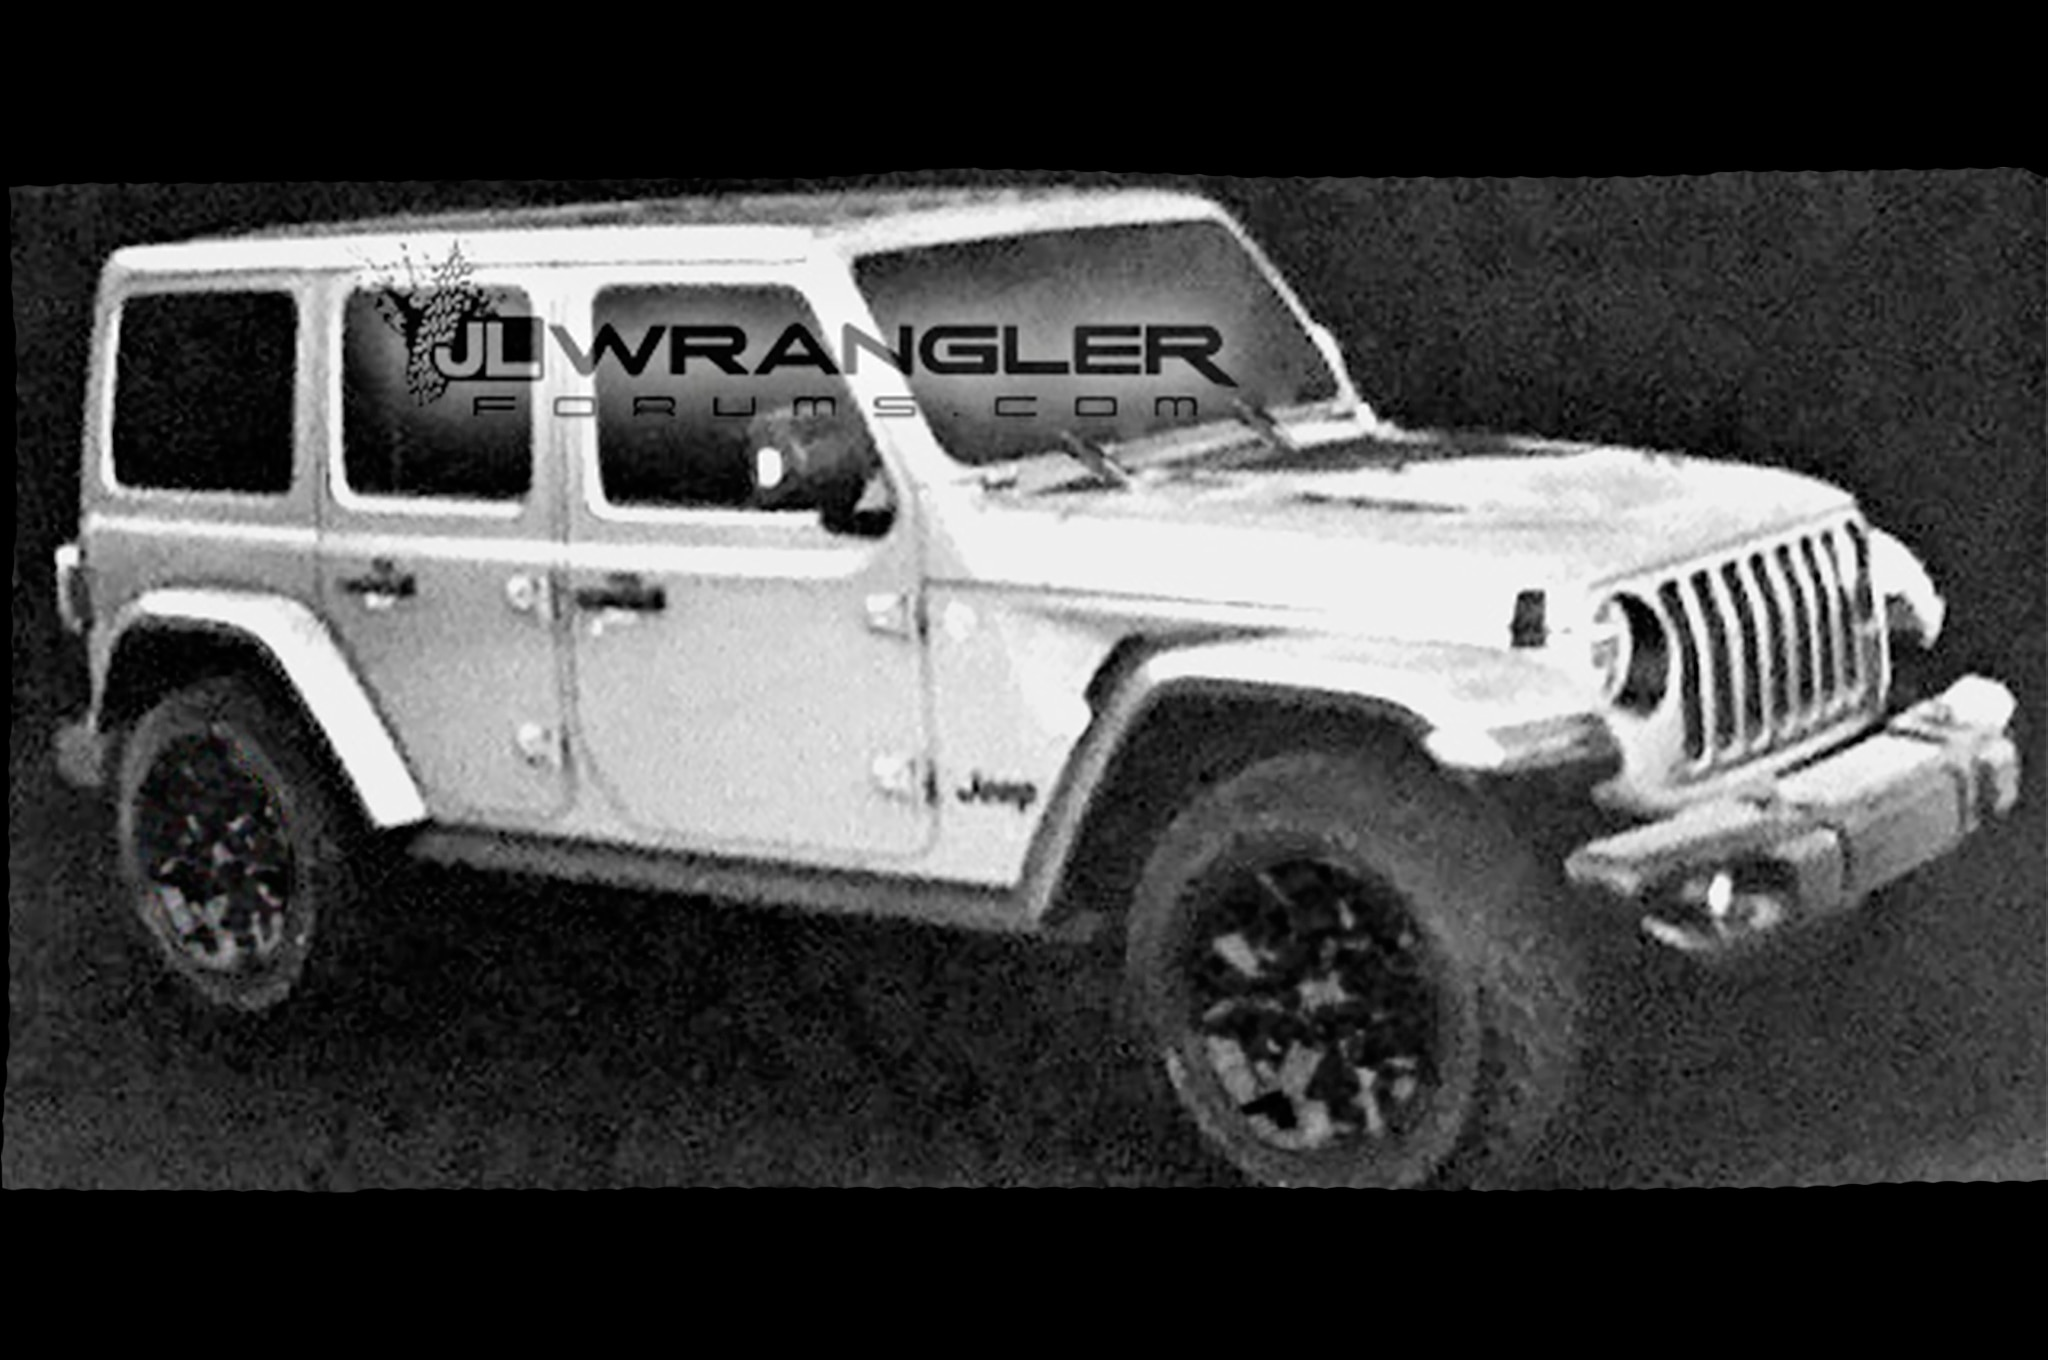 2018 Jl Wrangler Unlimited Rubicon1